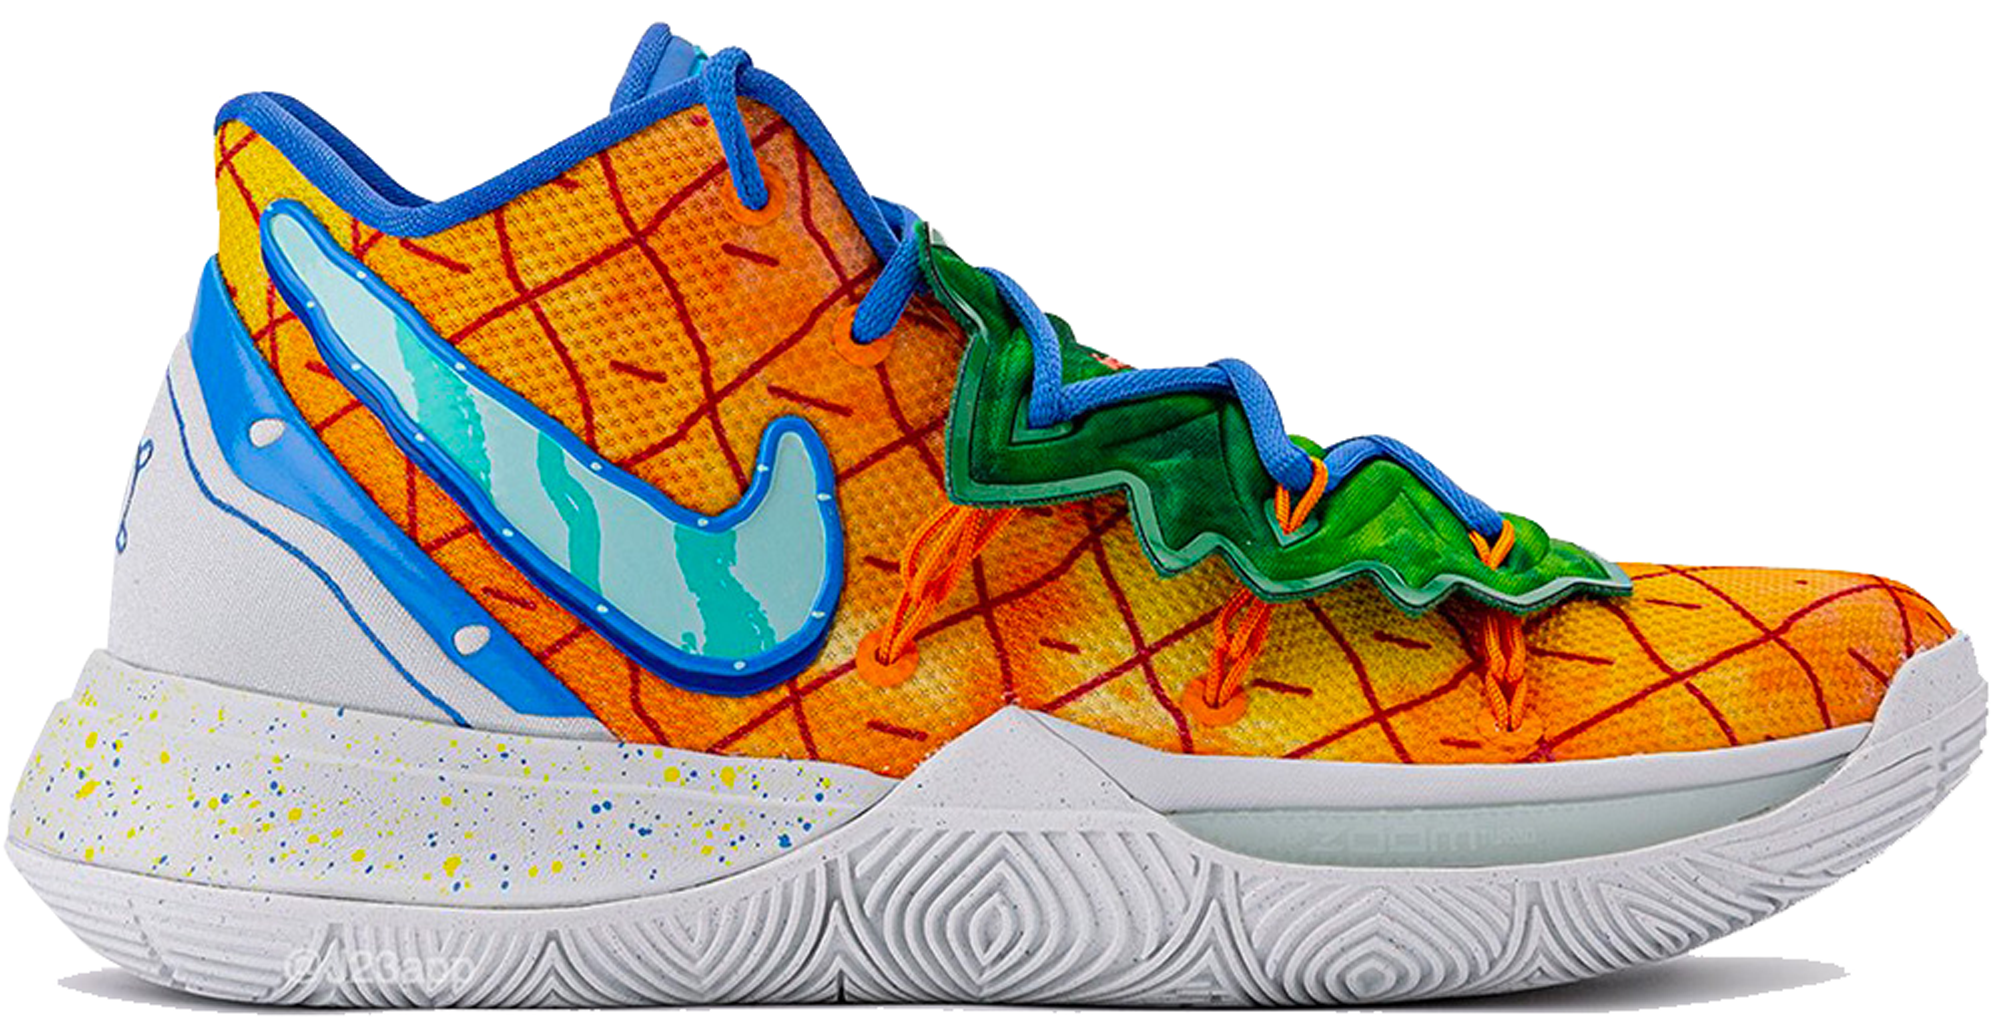 Nike Kyrie 5 Spongebob Pineapple House | Kyrie irving shoes, Irving shoes,  Nike kyrie